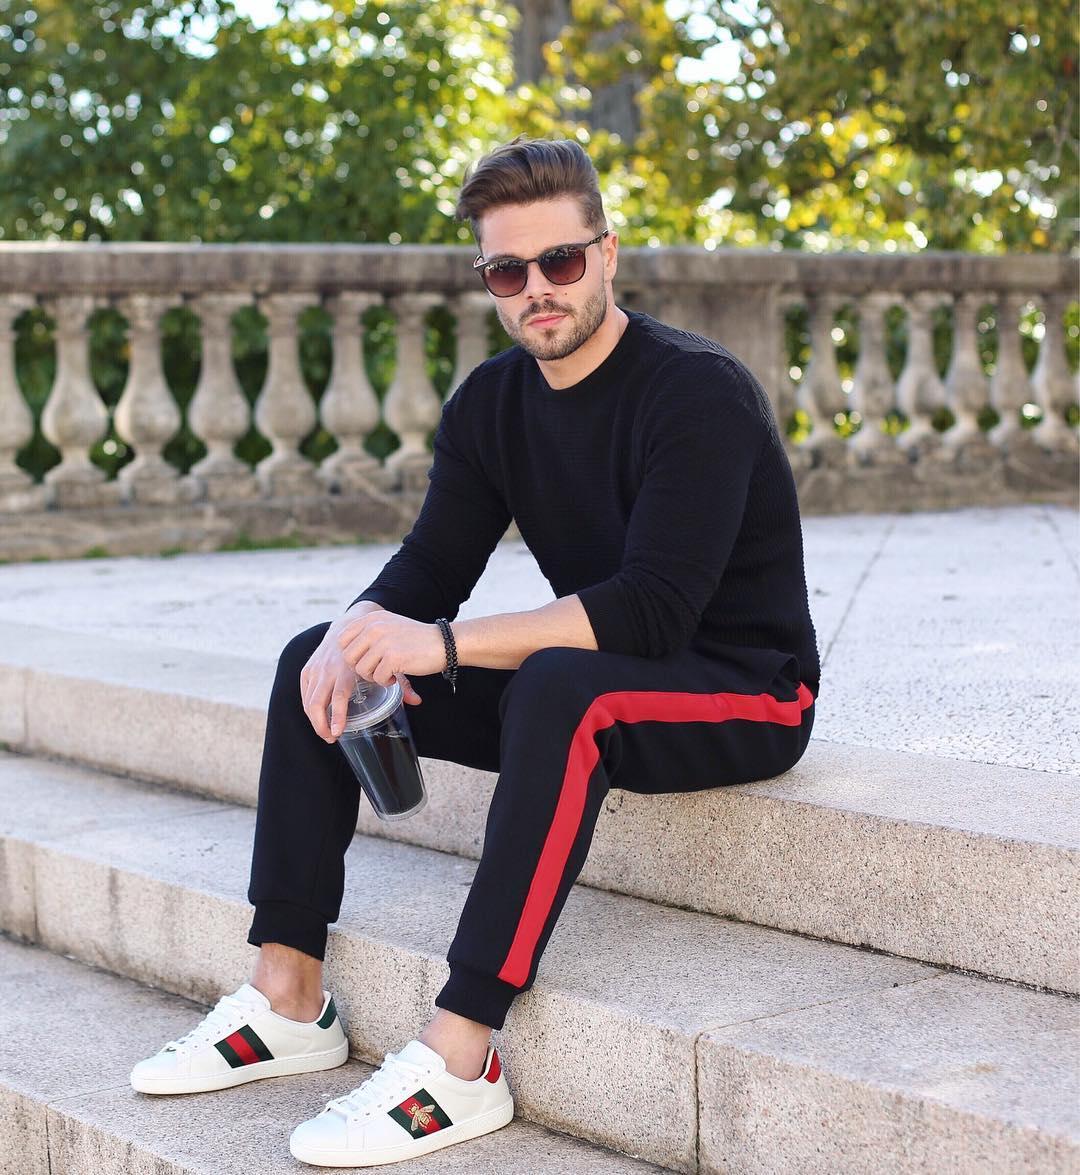 @stefanotratto • S.O.S Pedro - Blog de moda masculina